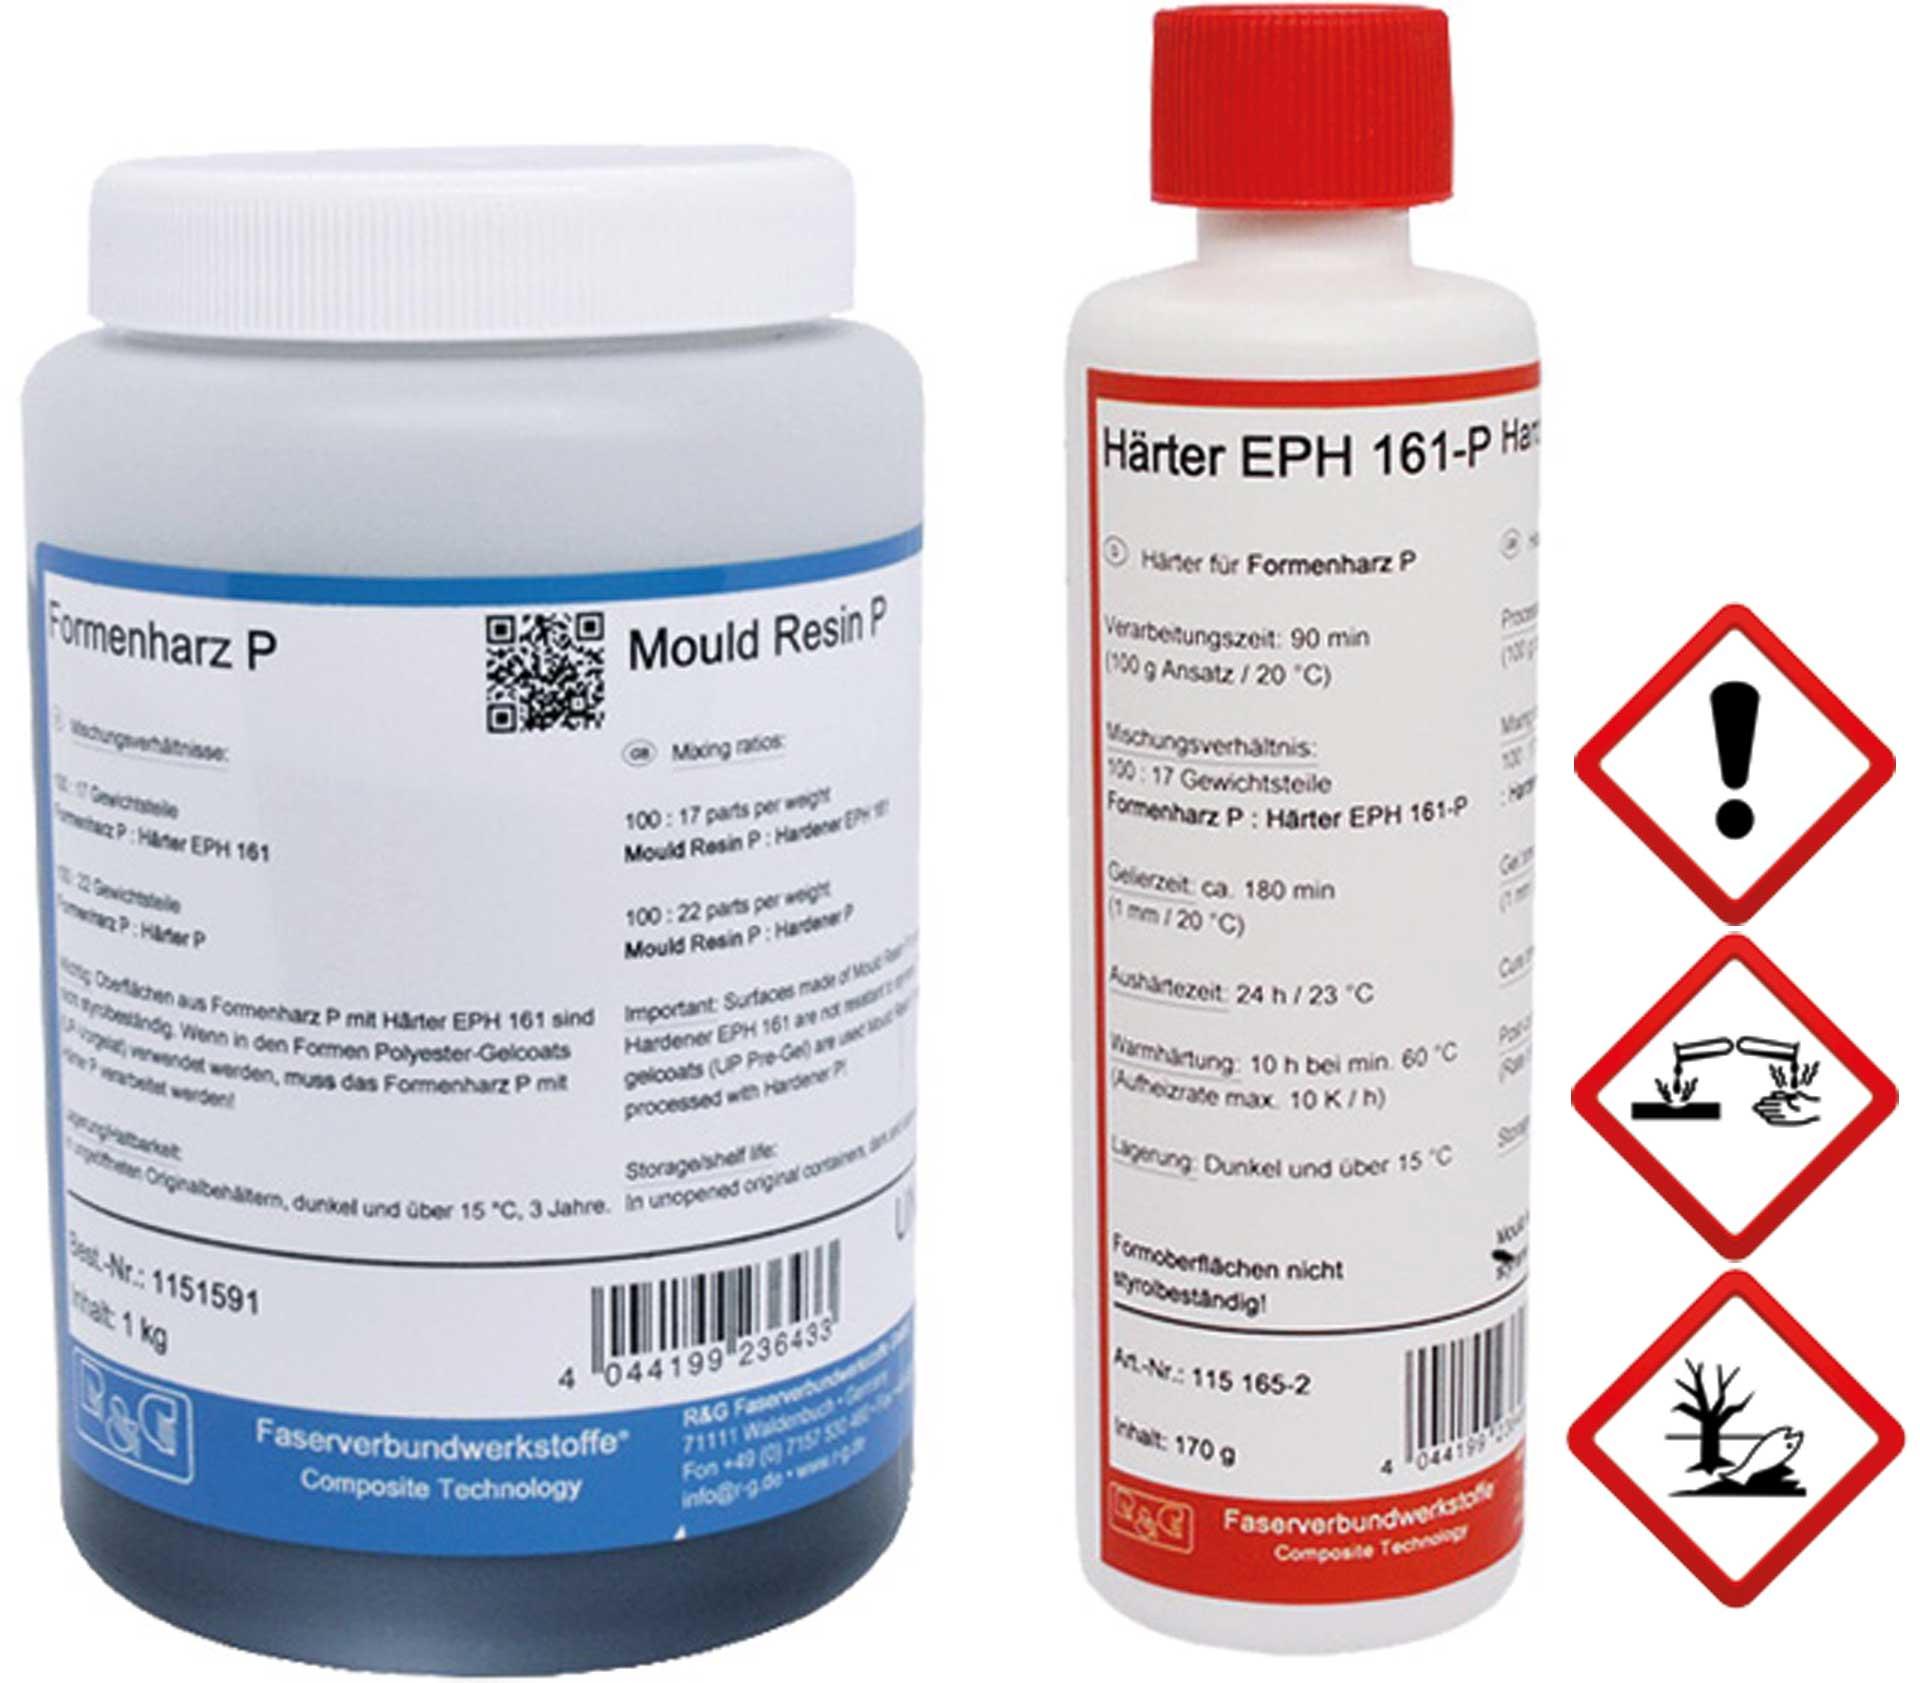 R&G Formenharz P + Härter (EPH 161-P) Packung/ 1,17 kg